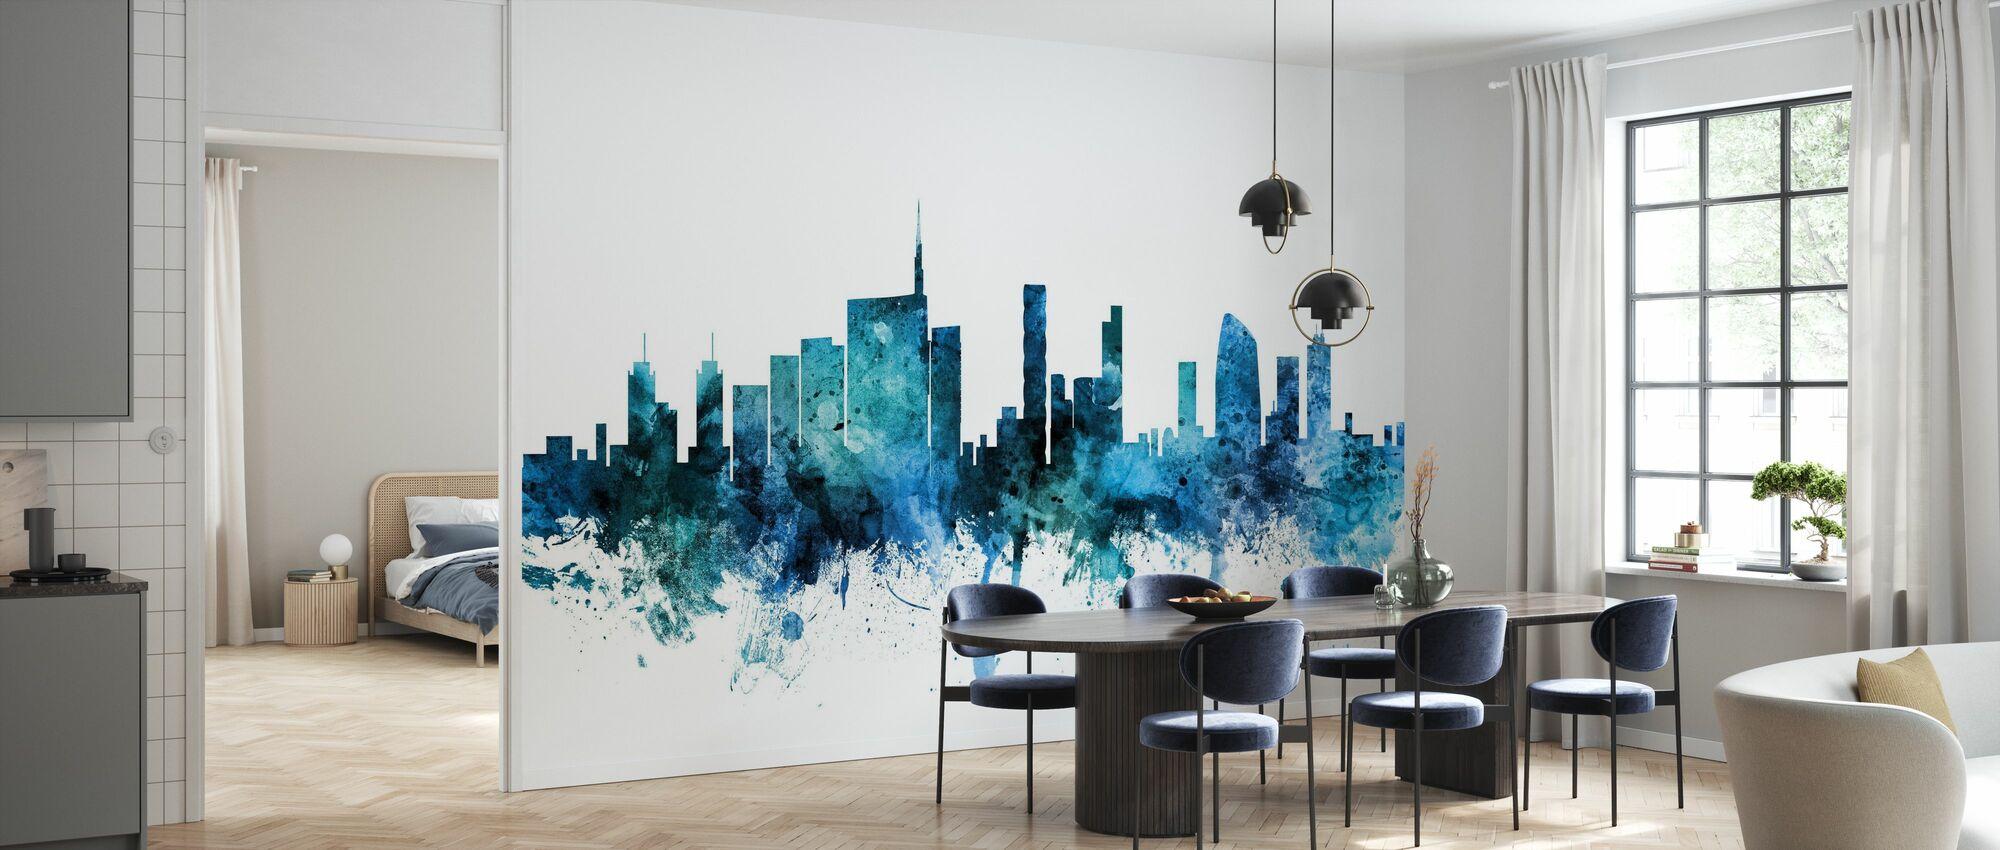 Milan Italy Skyline - Wallpaper - Kitchen